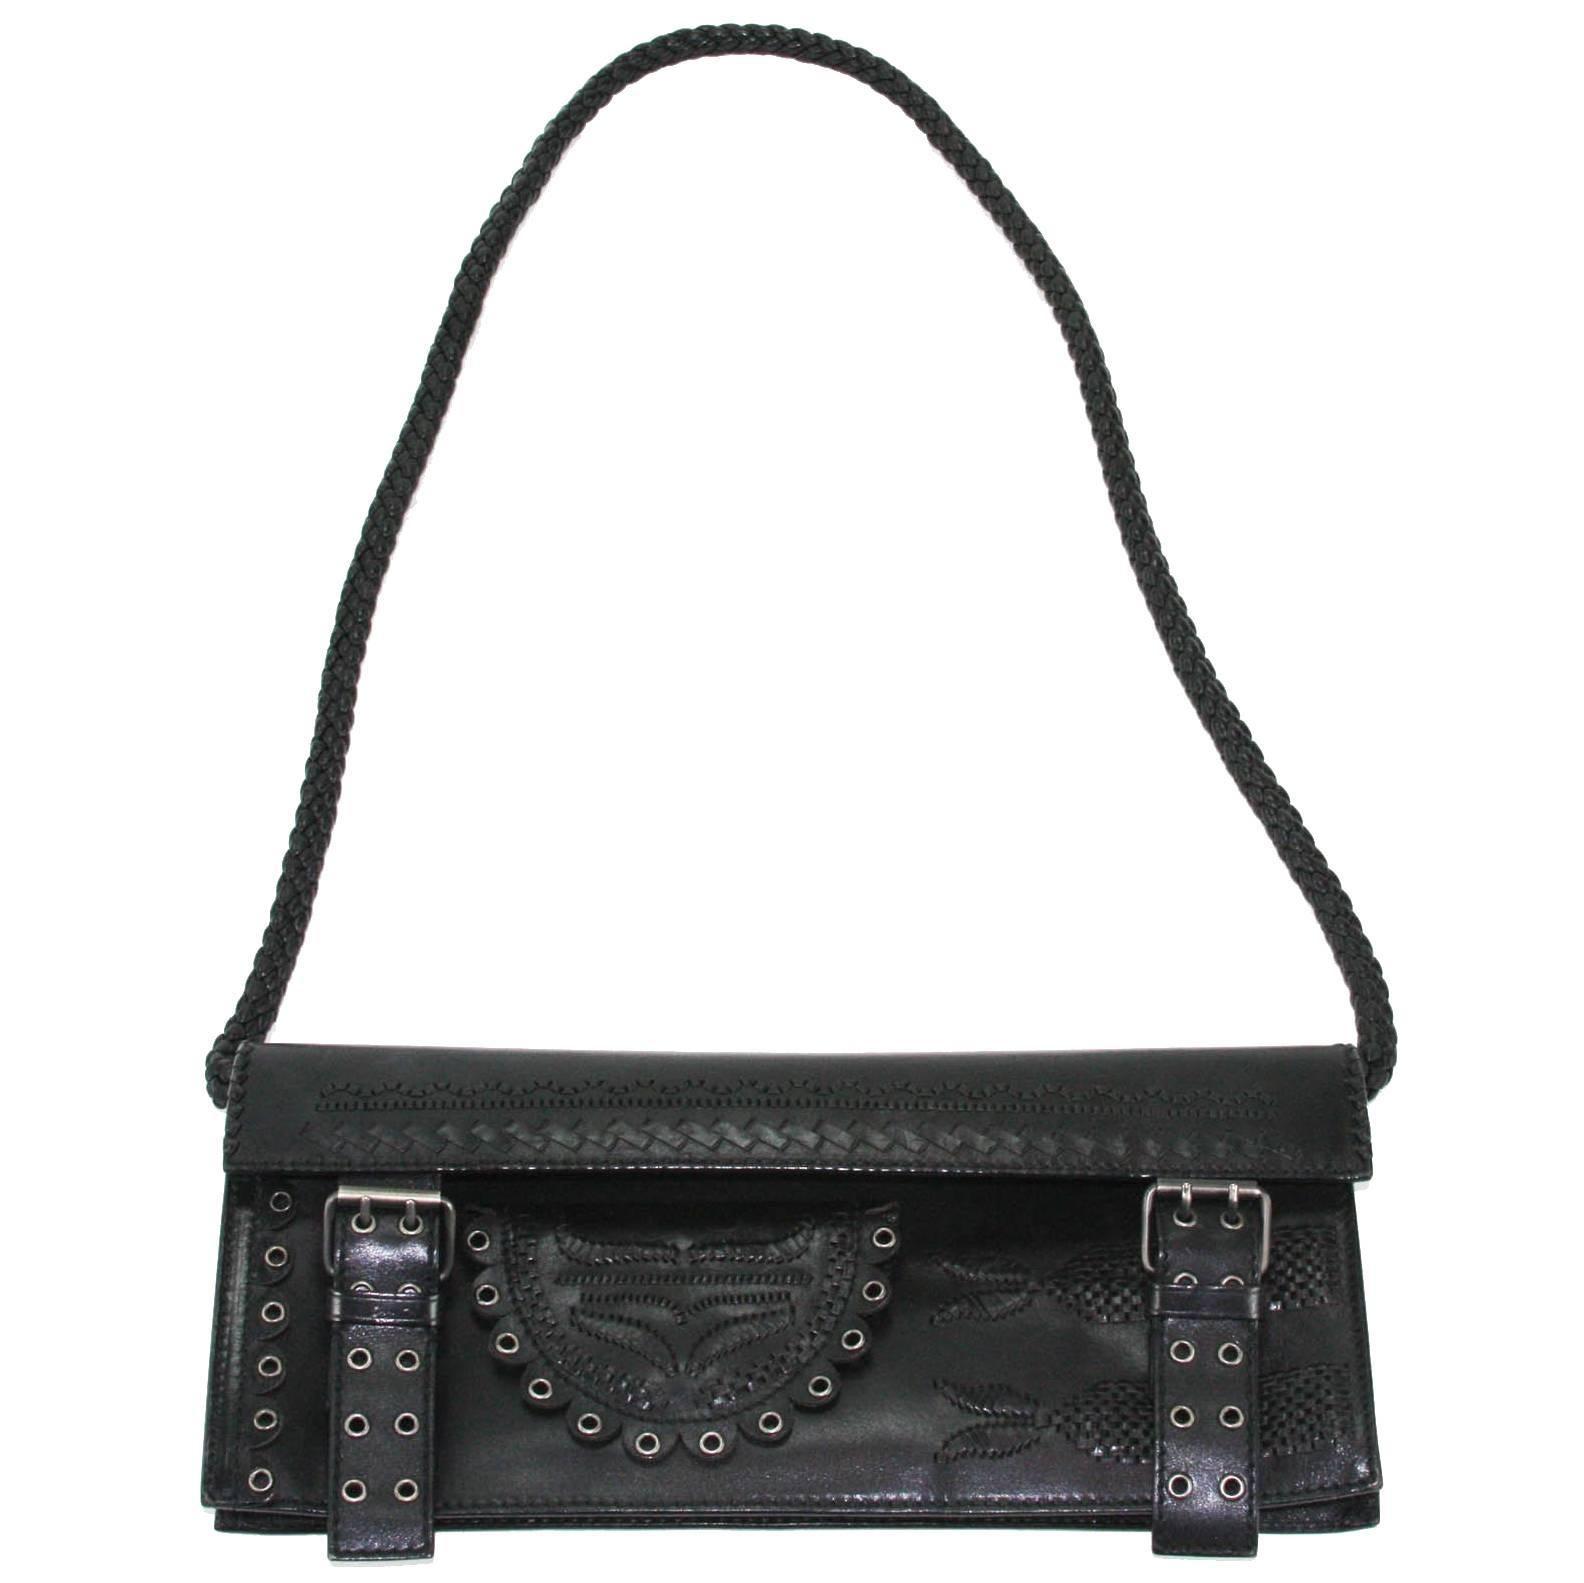 Tom Ford for Yves Saint Laurent F/W 2001 Collection Shoulder Bag Clutch